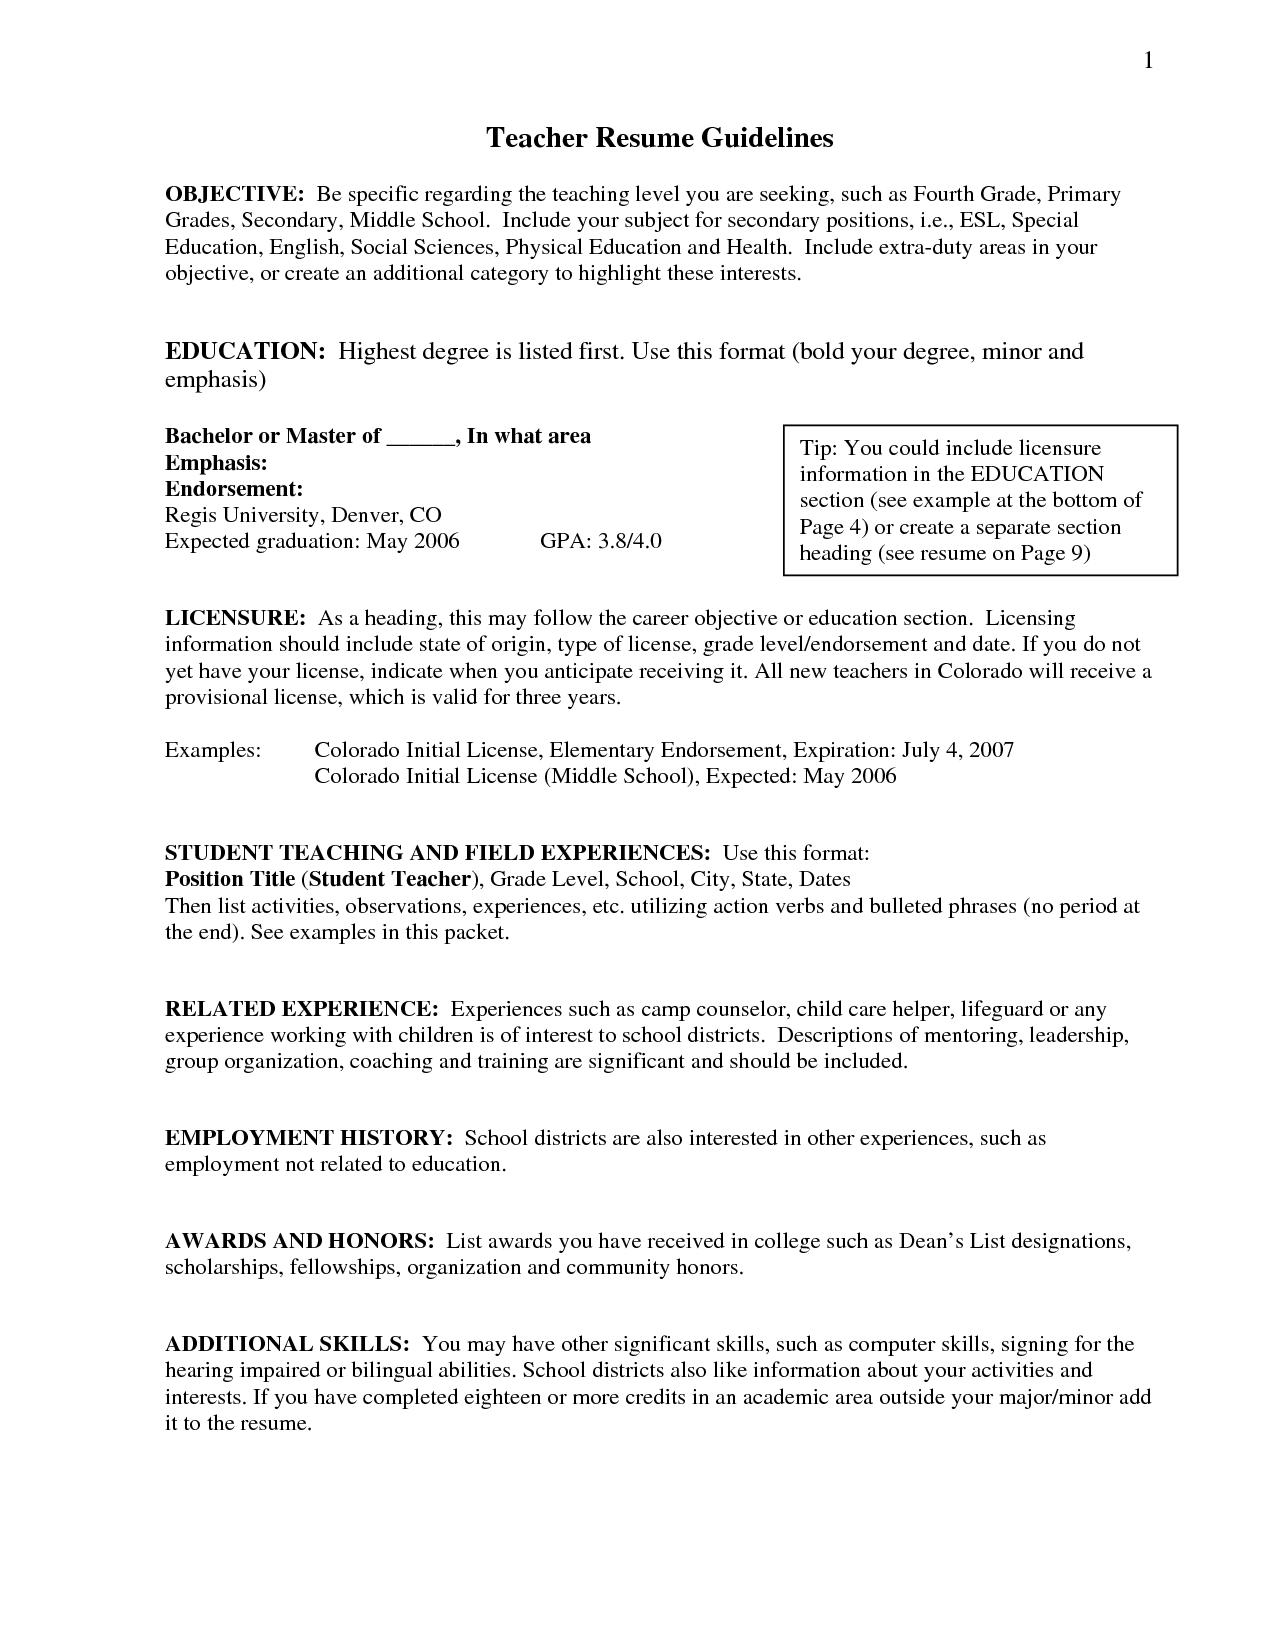 Resume Objective Statement For Teacher